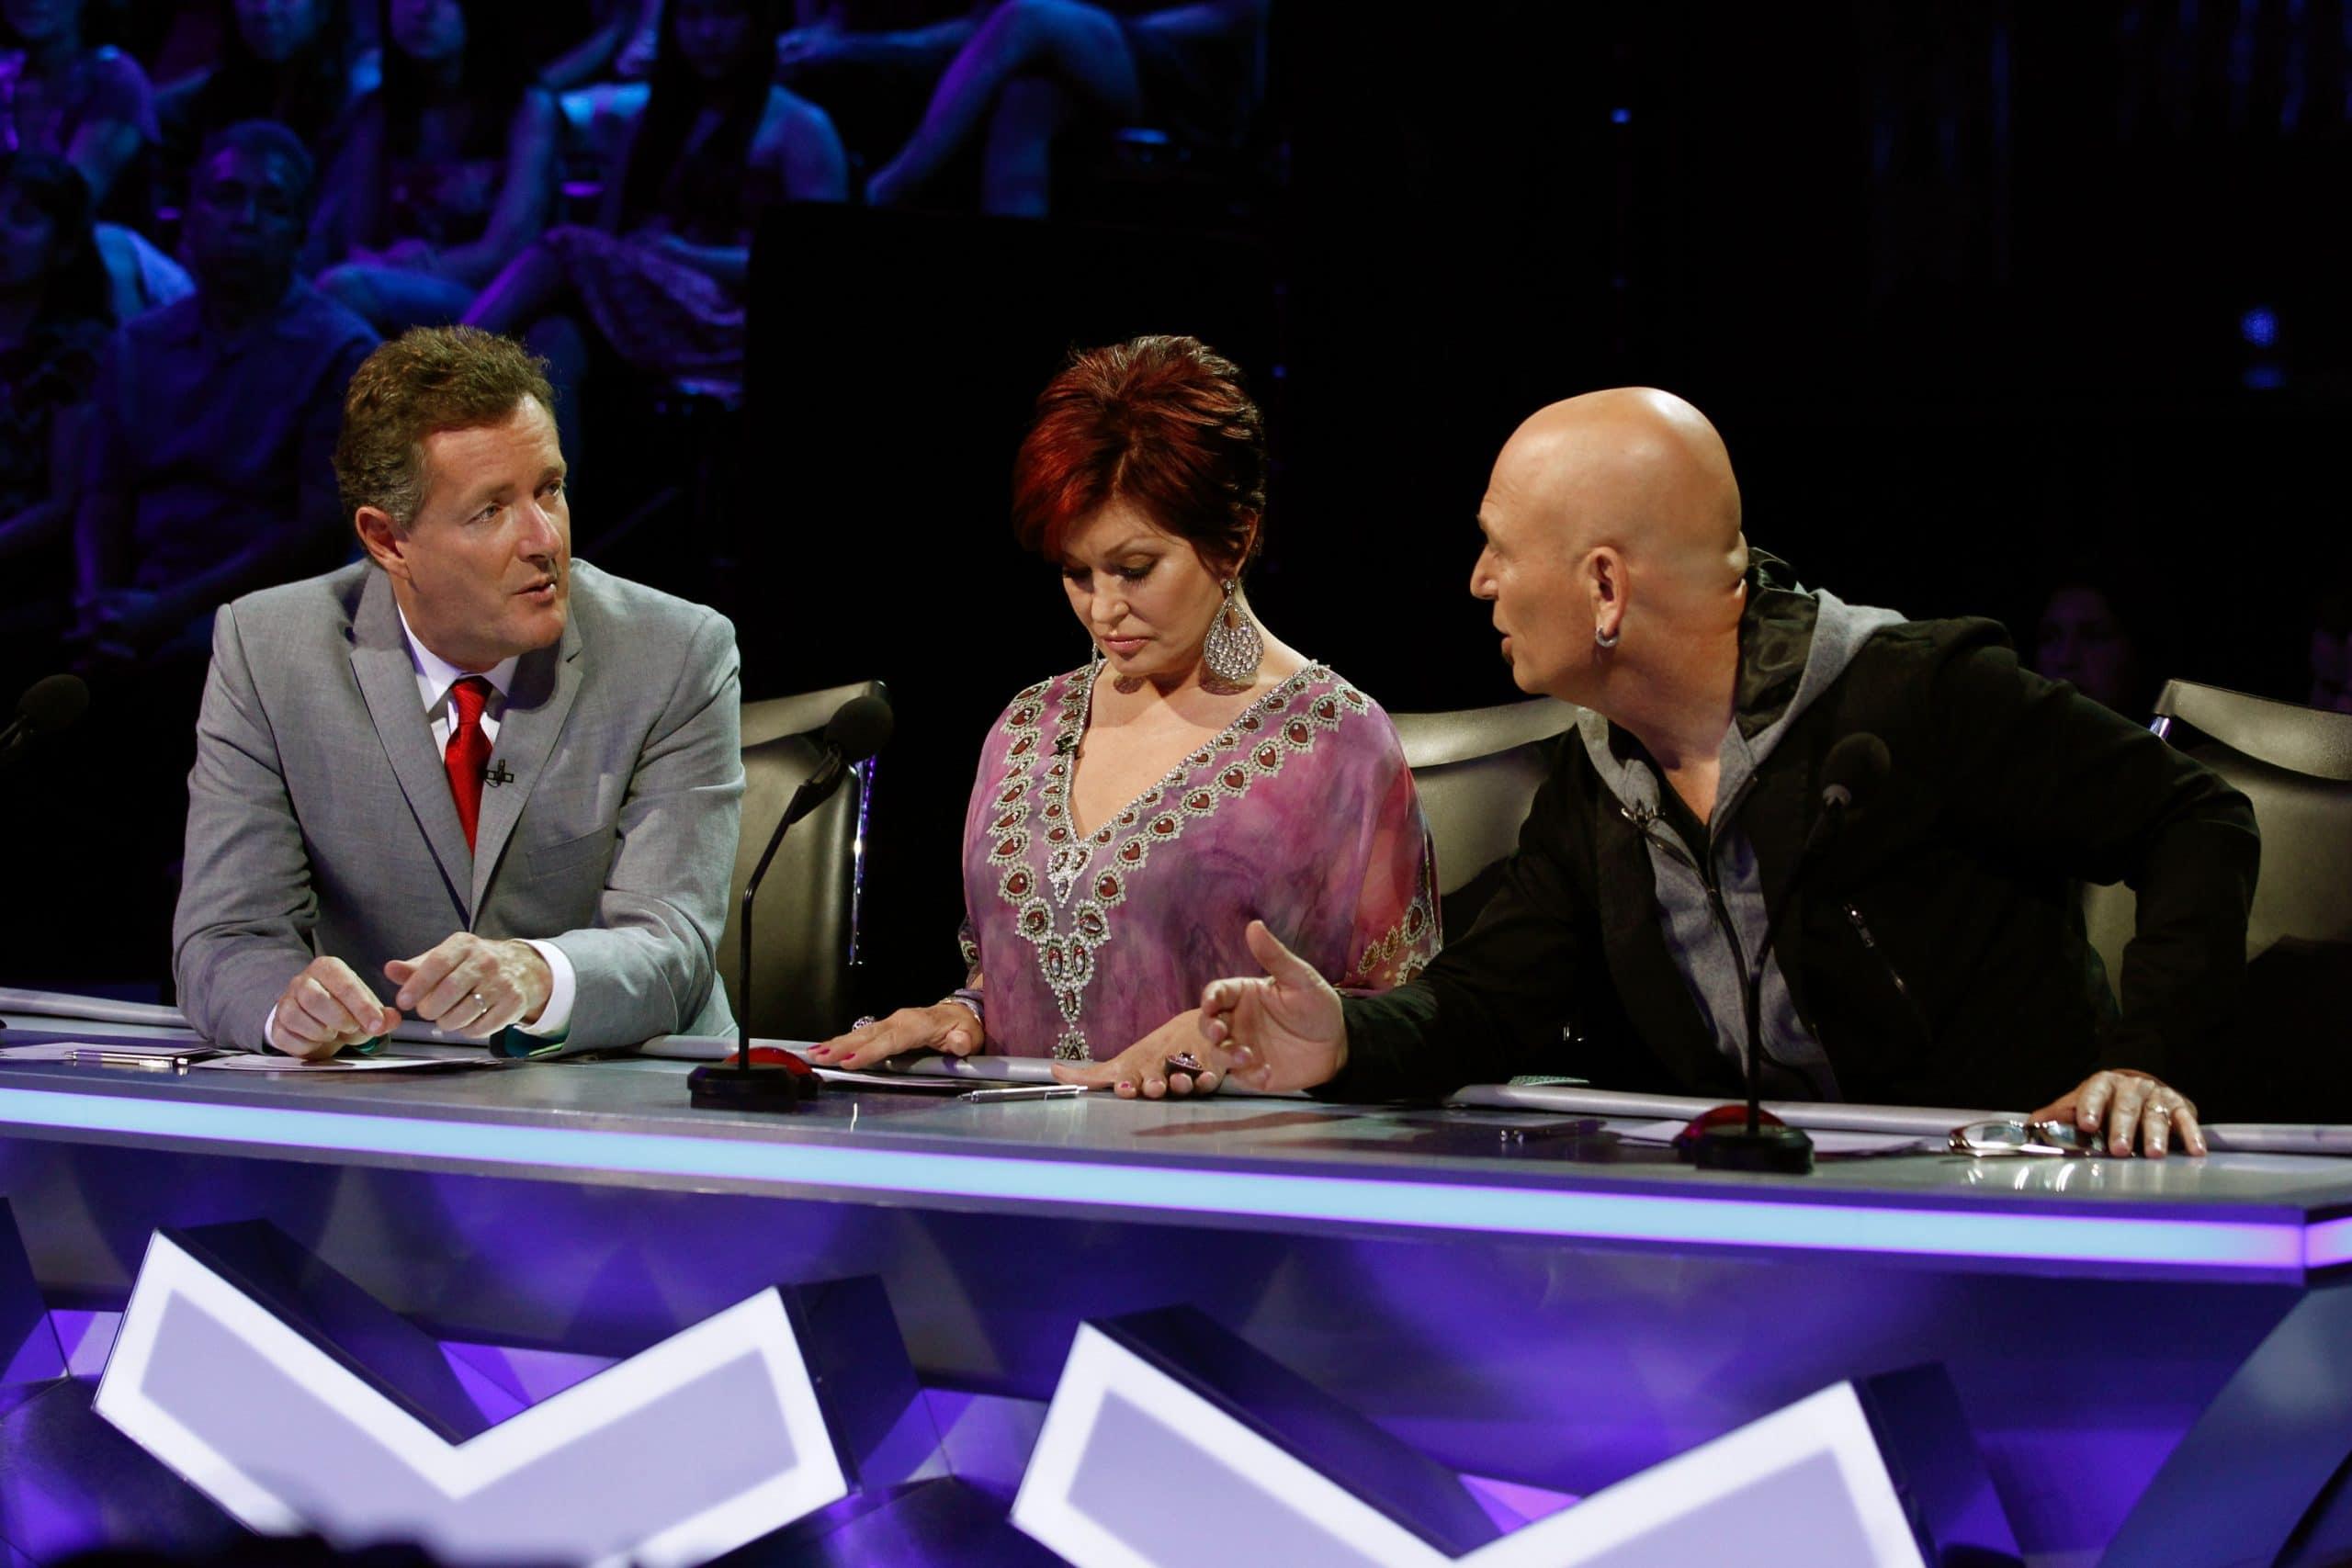 AMERICA'S GOT TALENT judges Piers Morgan, Sharon Osbourne, Howie Mandel